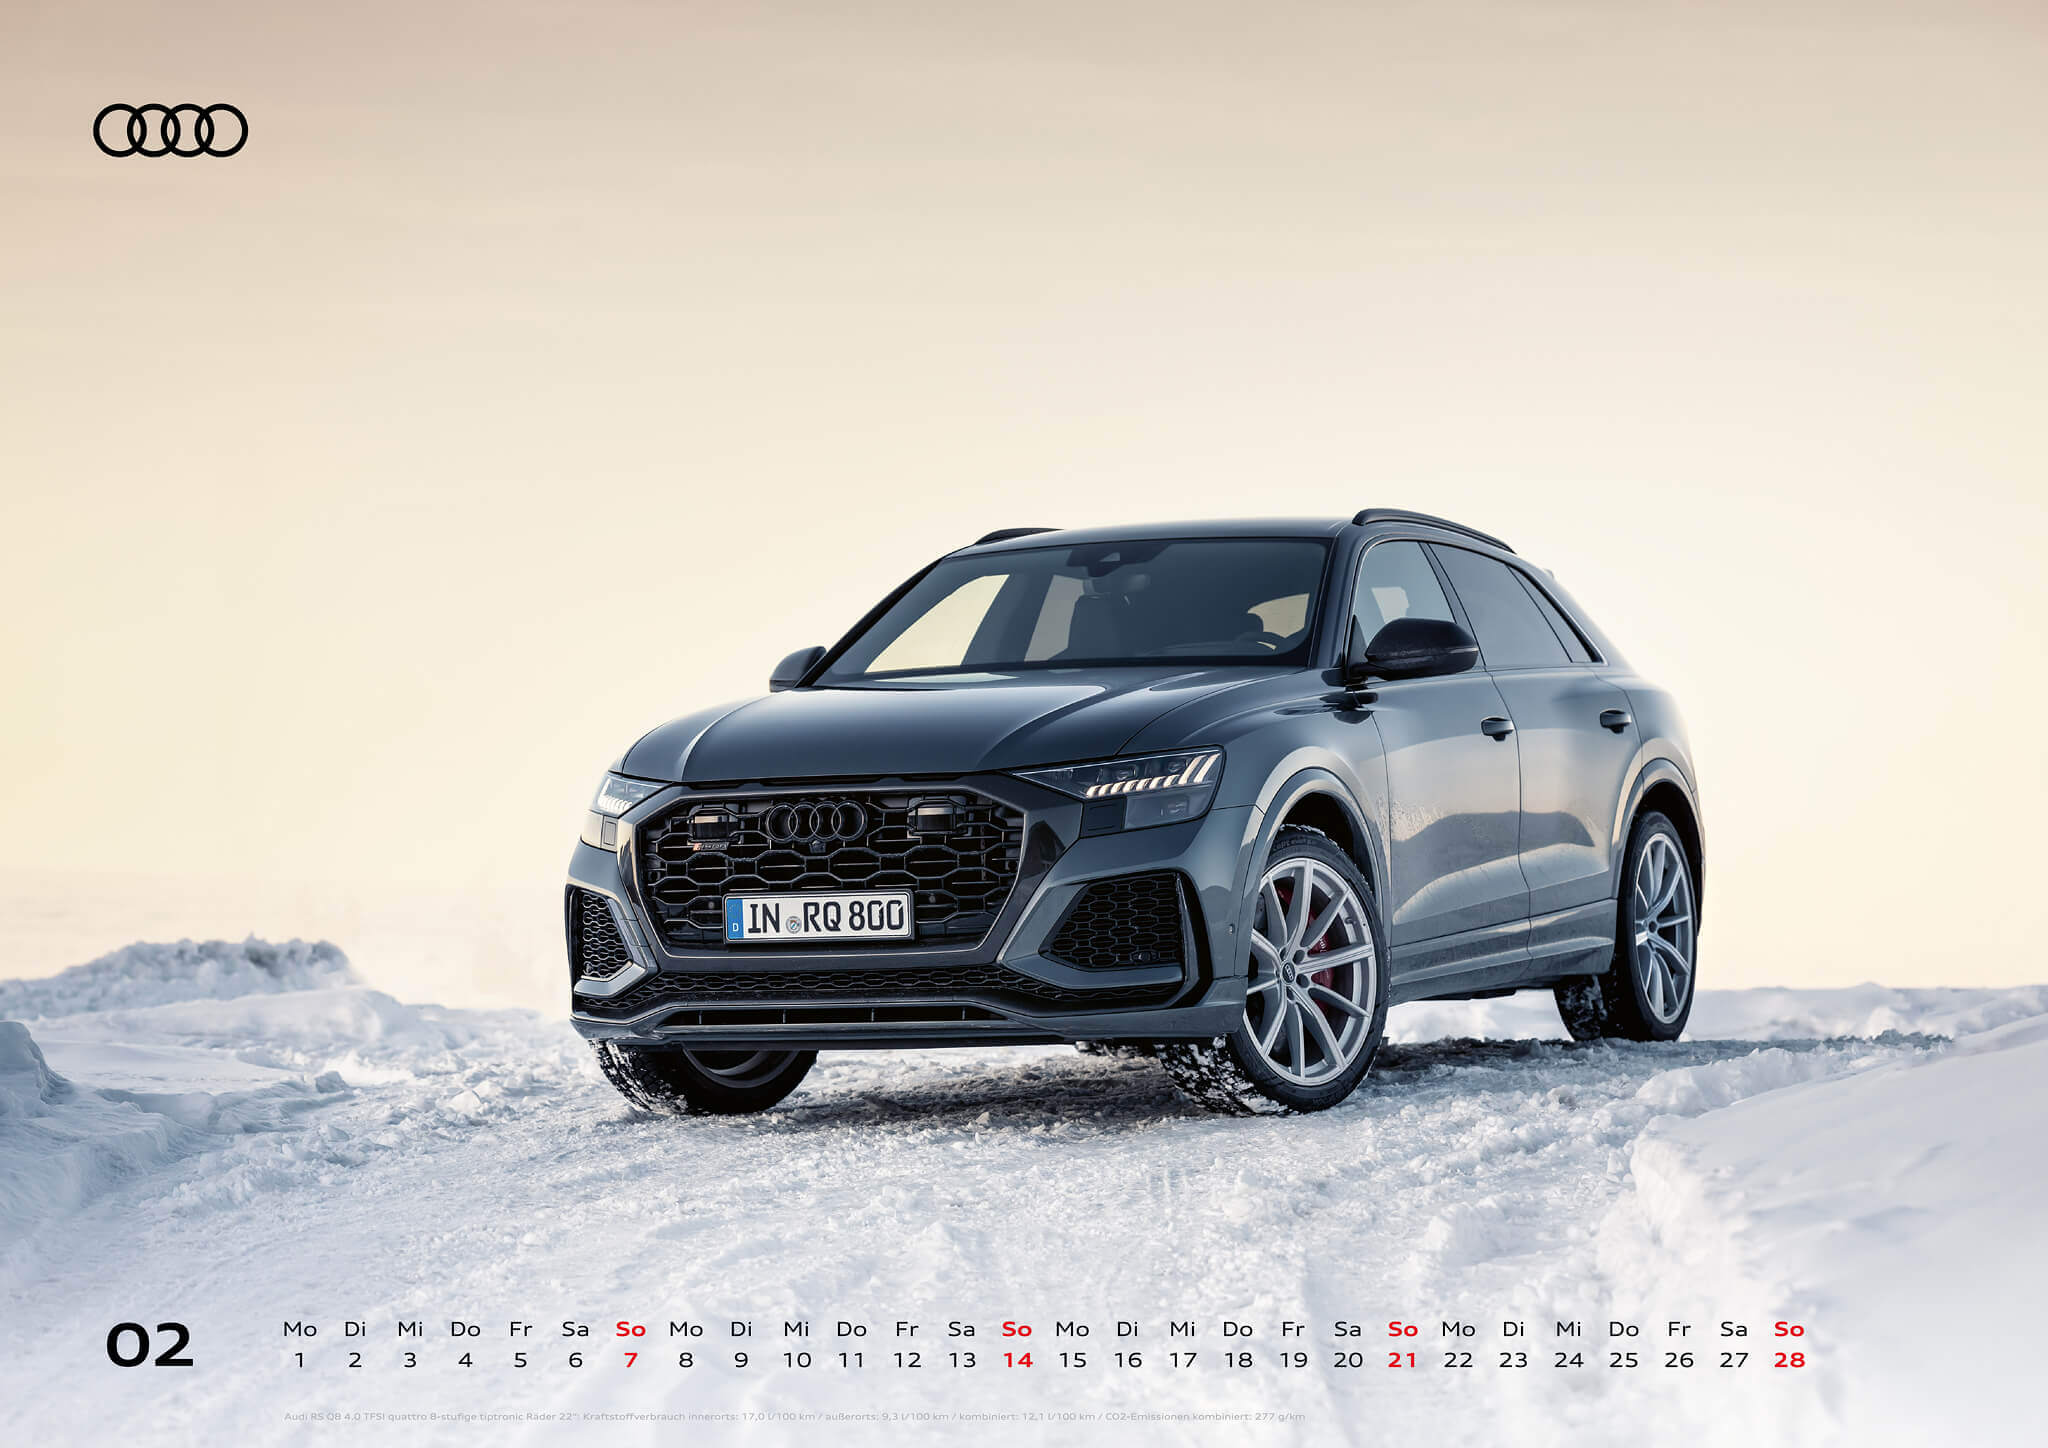 Audi Kalender 2021 - DIN A2 / Audi RSQ8